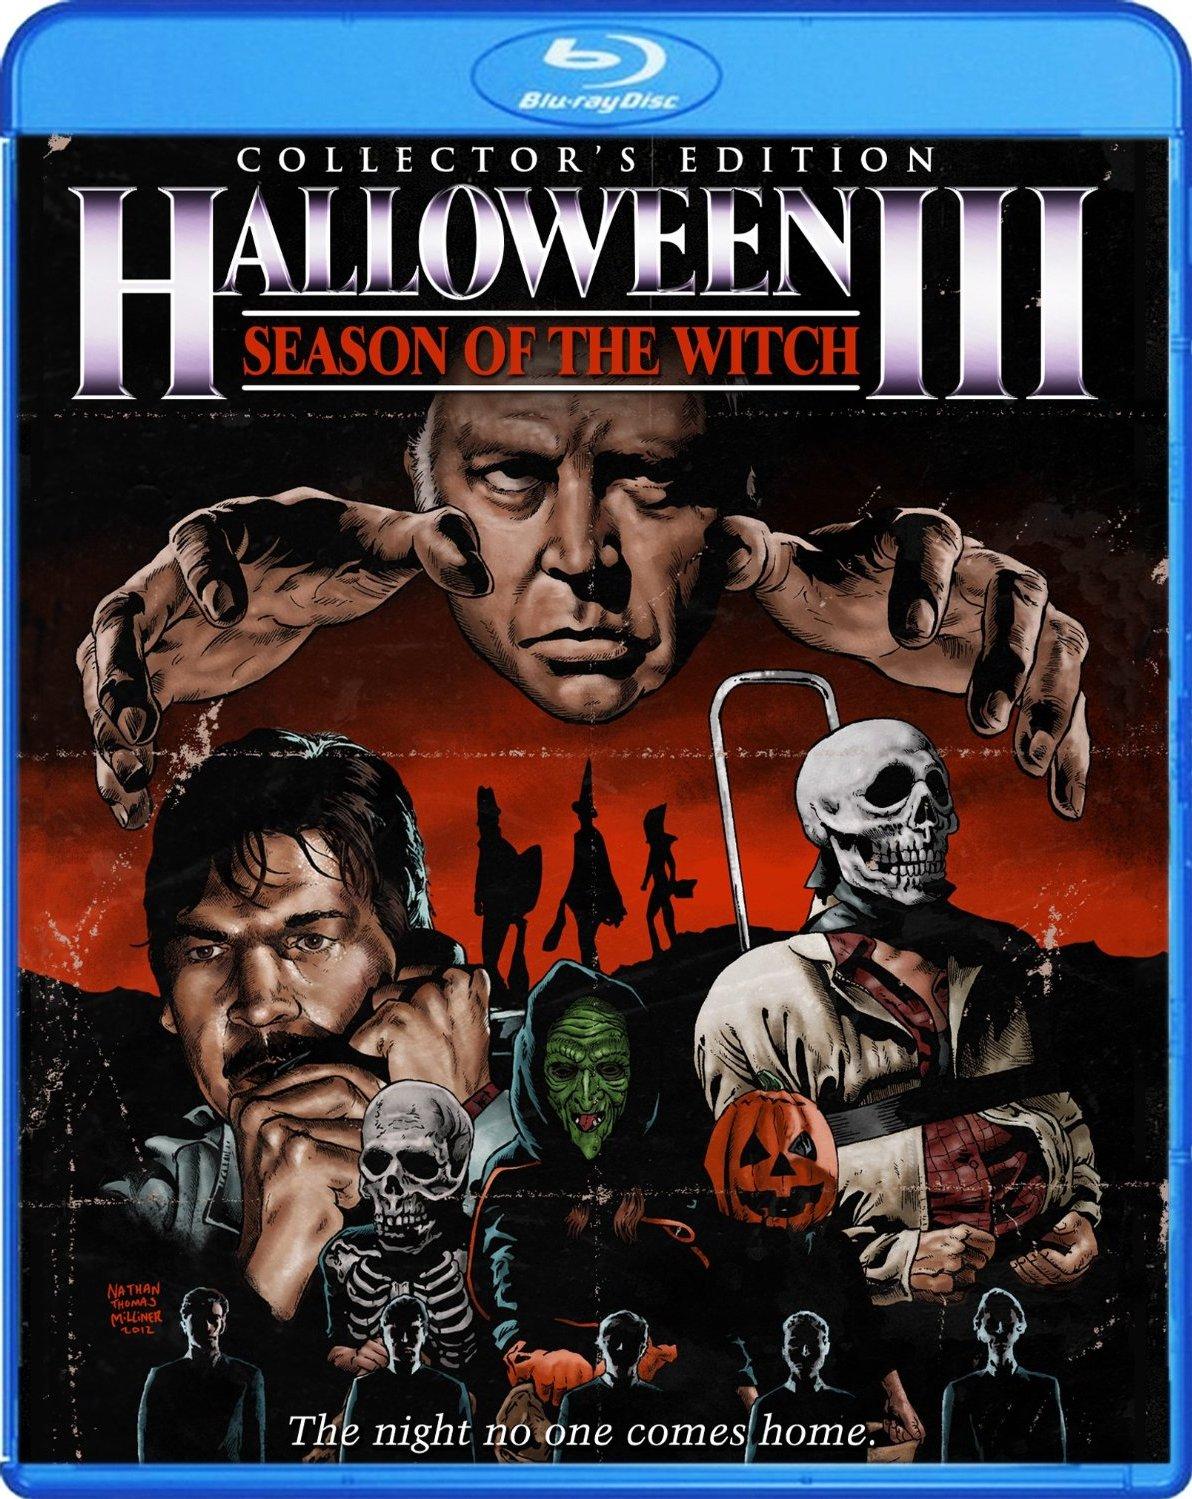 http://1.bp.blogspot.com/-QV9J6BZFeMI/UFA_TiAlwxI/AAAAAAAAFhE/J4JFuSTnKLE/s1600/Halloween+3.jpeg